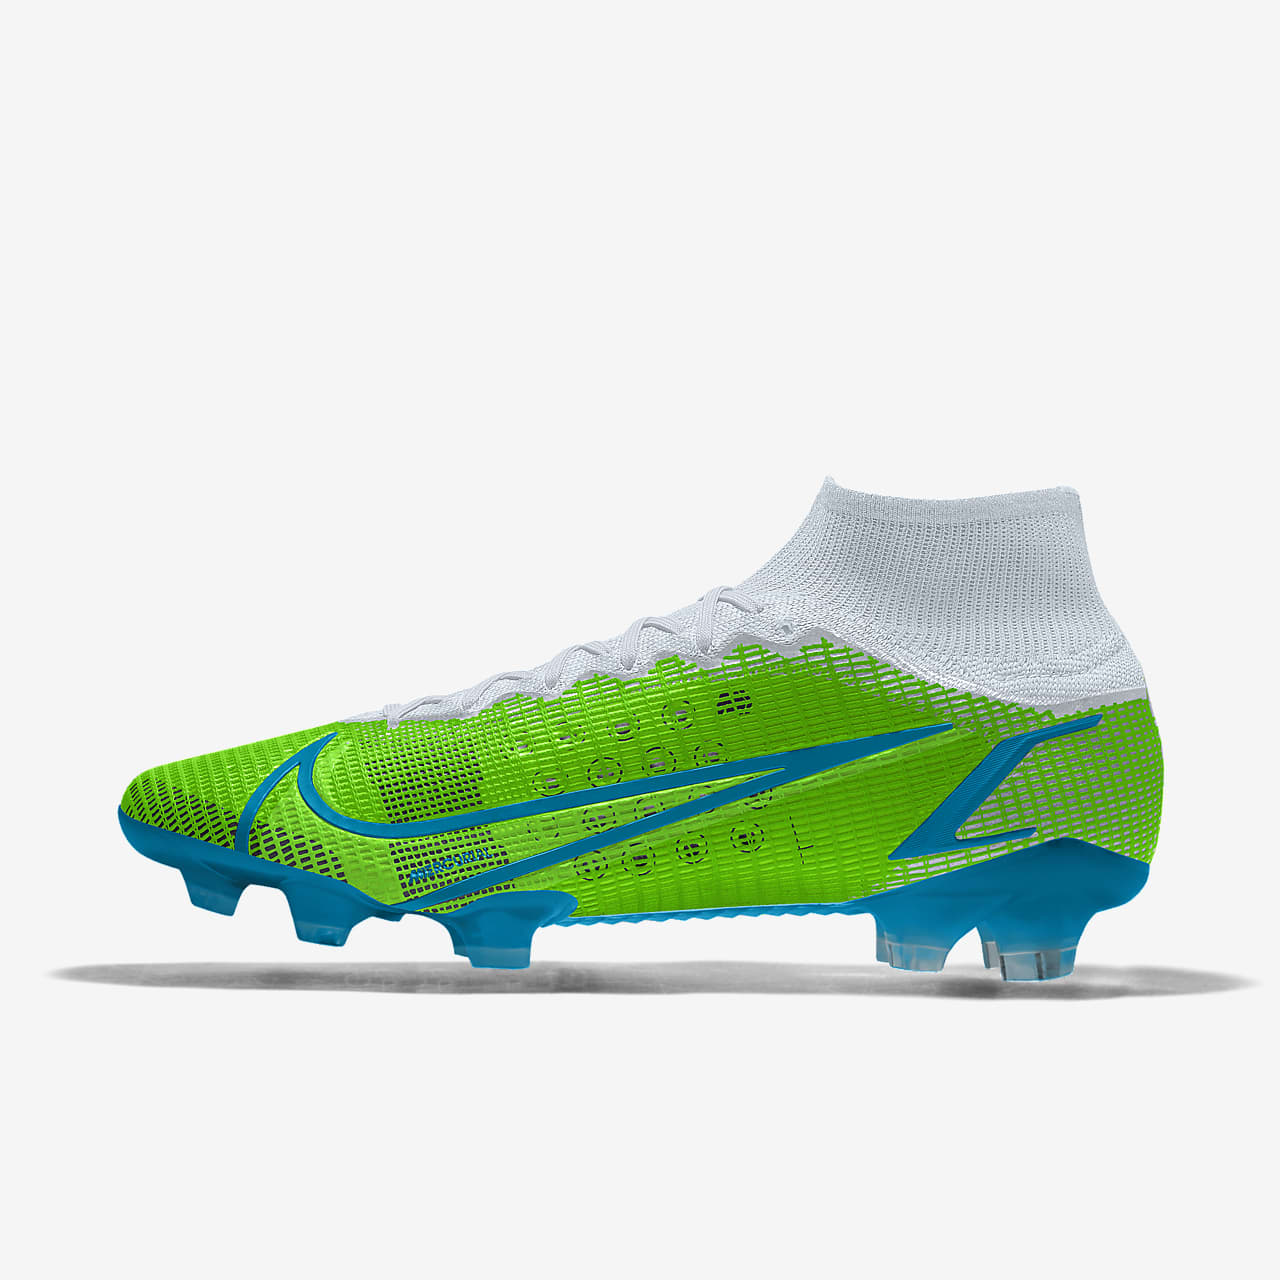 Nike Mercurial Superfly 8 Elite By You egyedi stoplis futballcipő